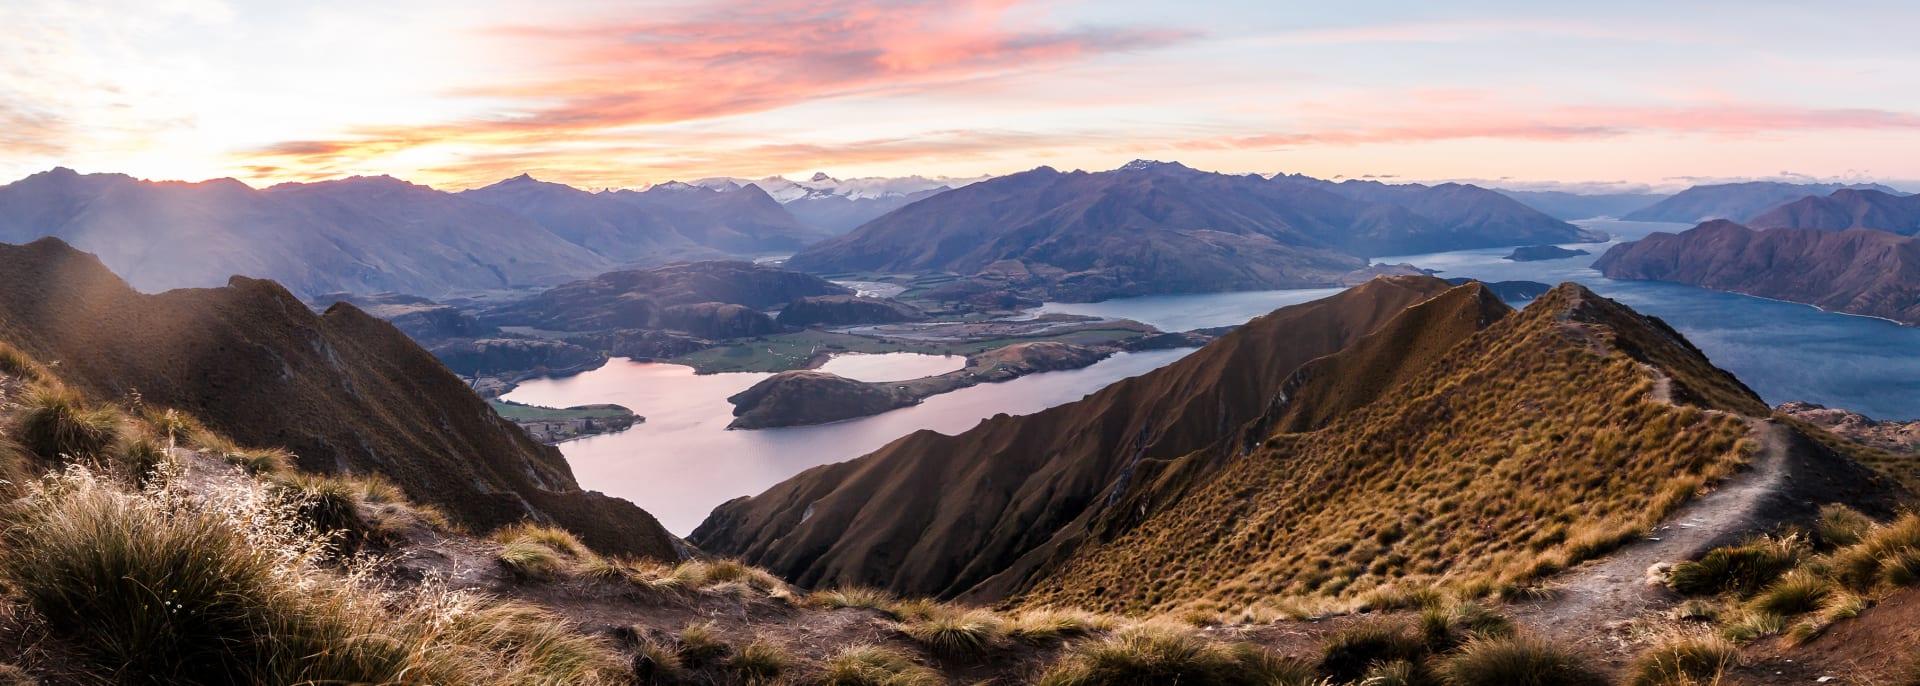 Alpen, Wandern, Neuseeland